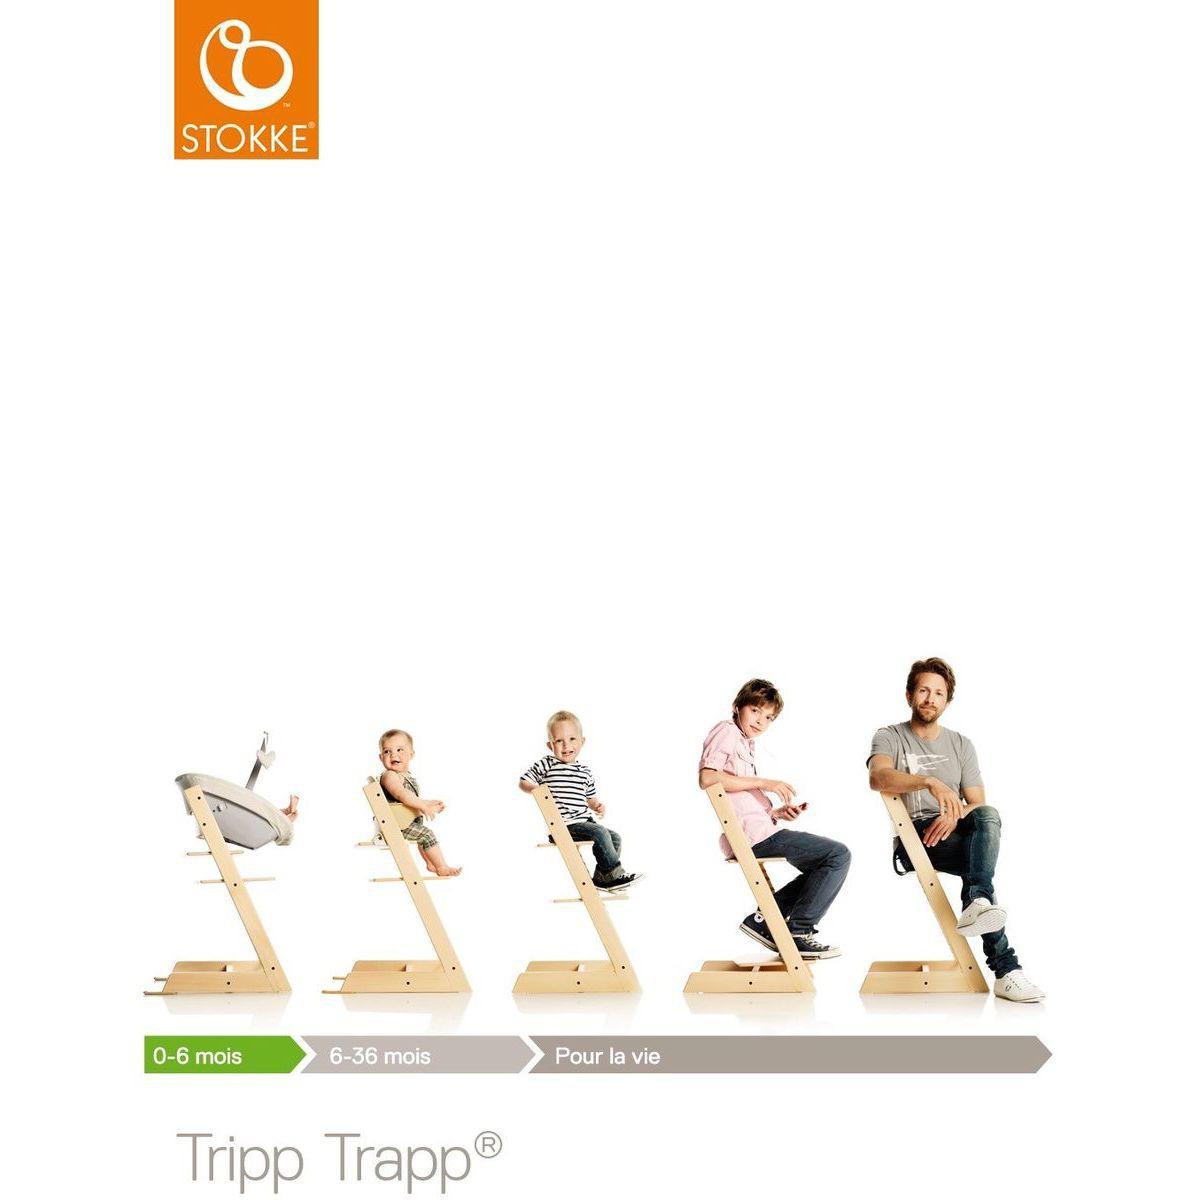 Chaise haute TRIPP TRAPP Stokke rose serein